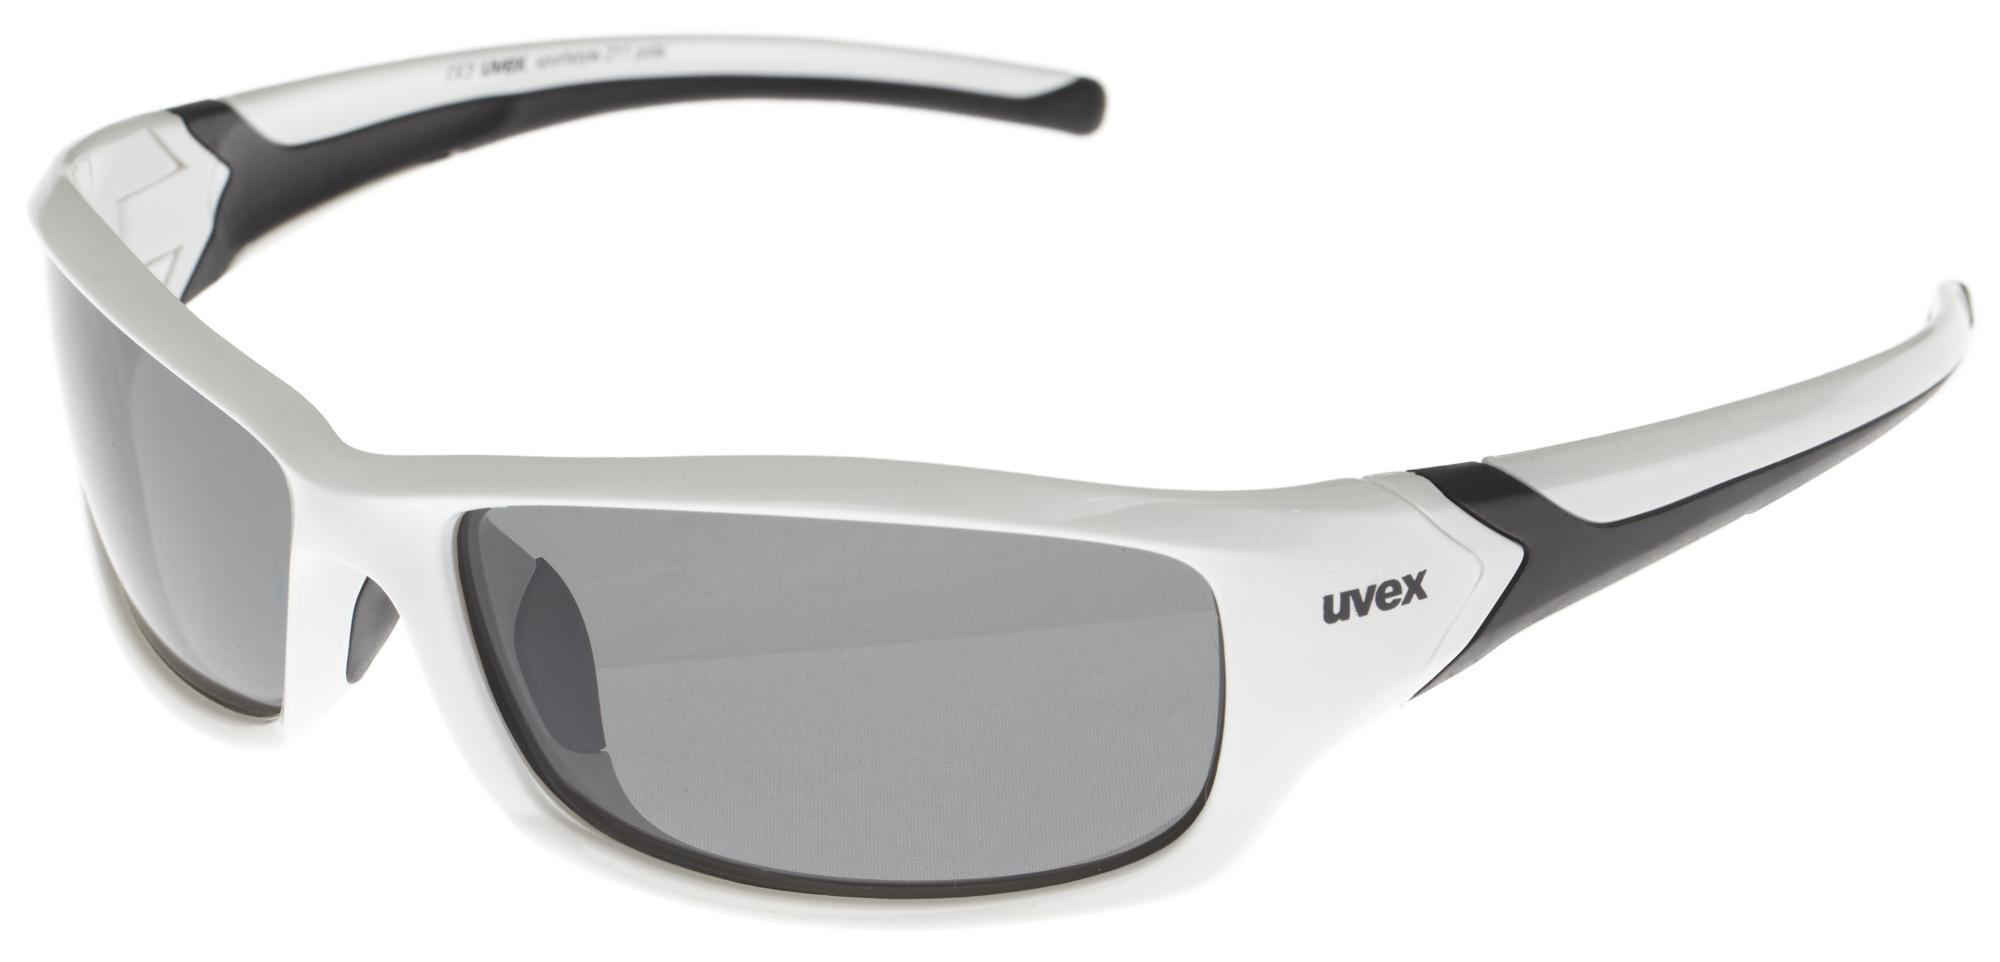 Uvex Солнцезащитные очки Uvex 211 Pola цена и фото